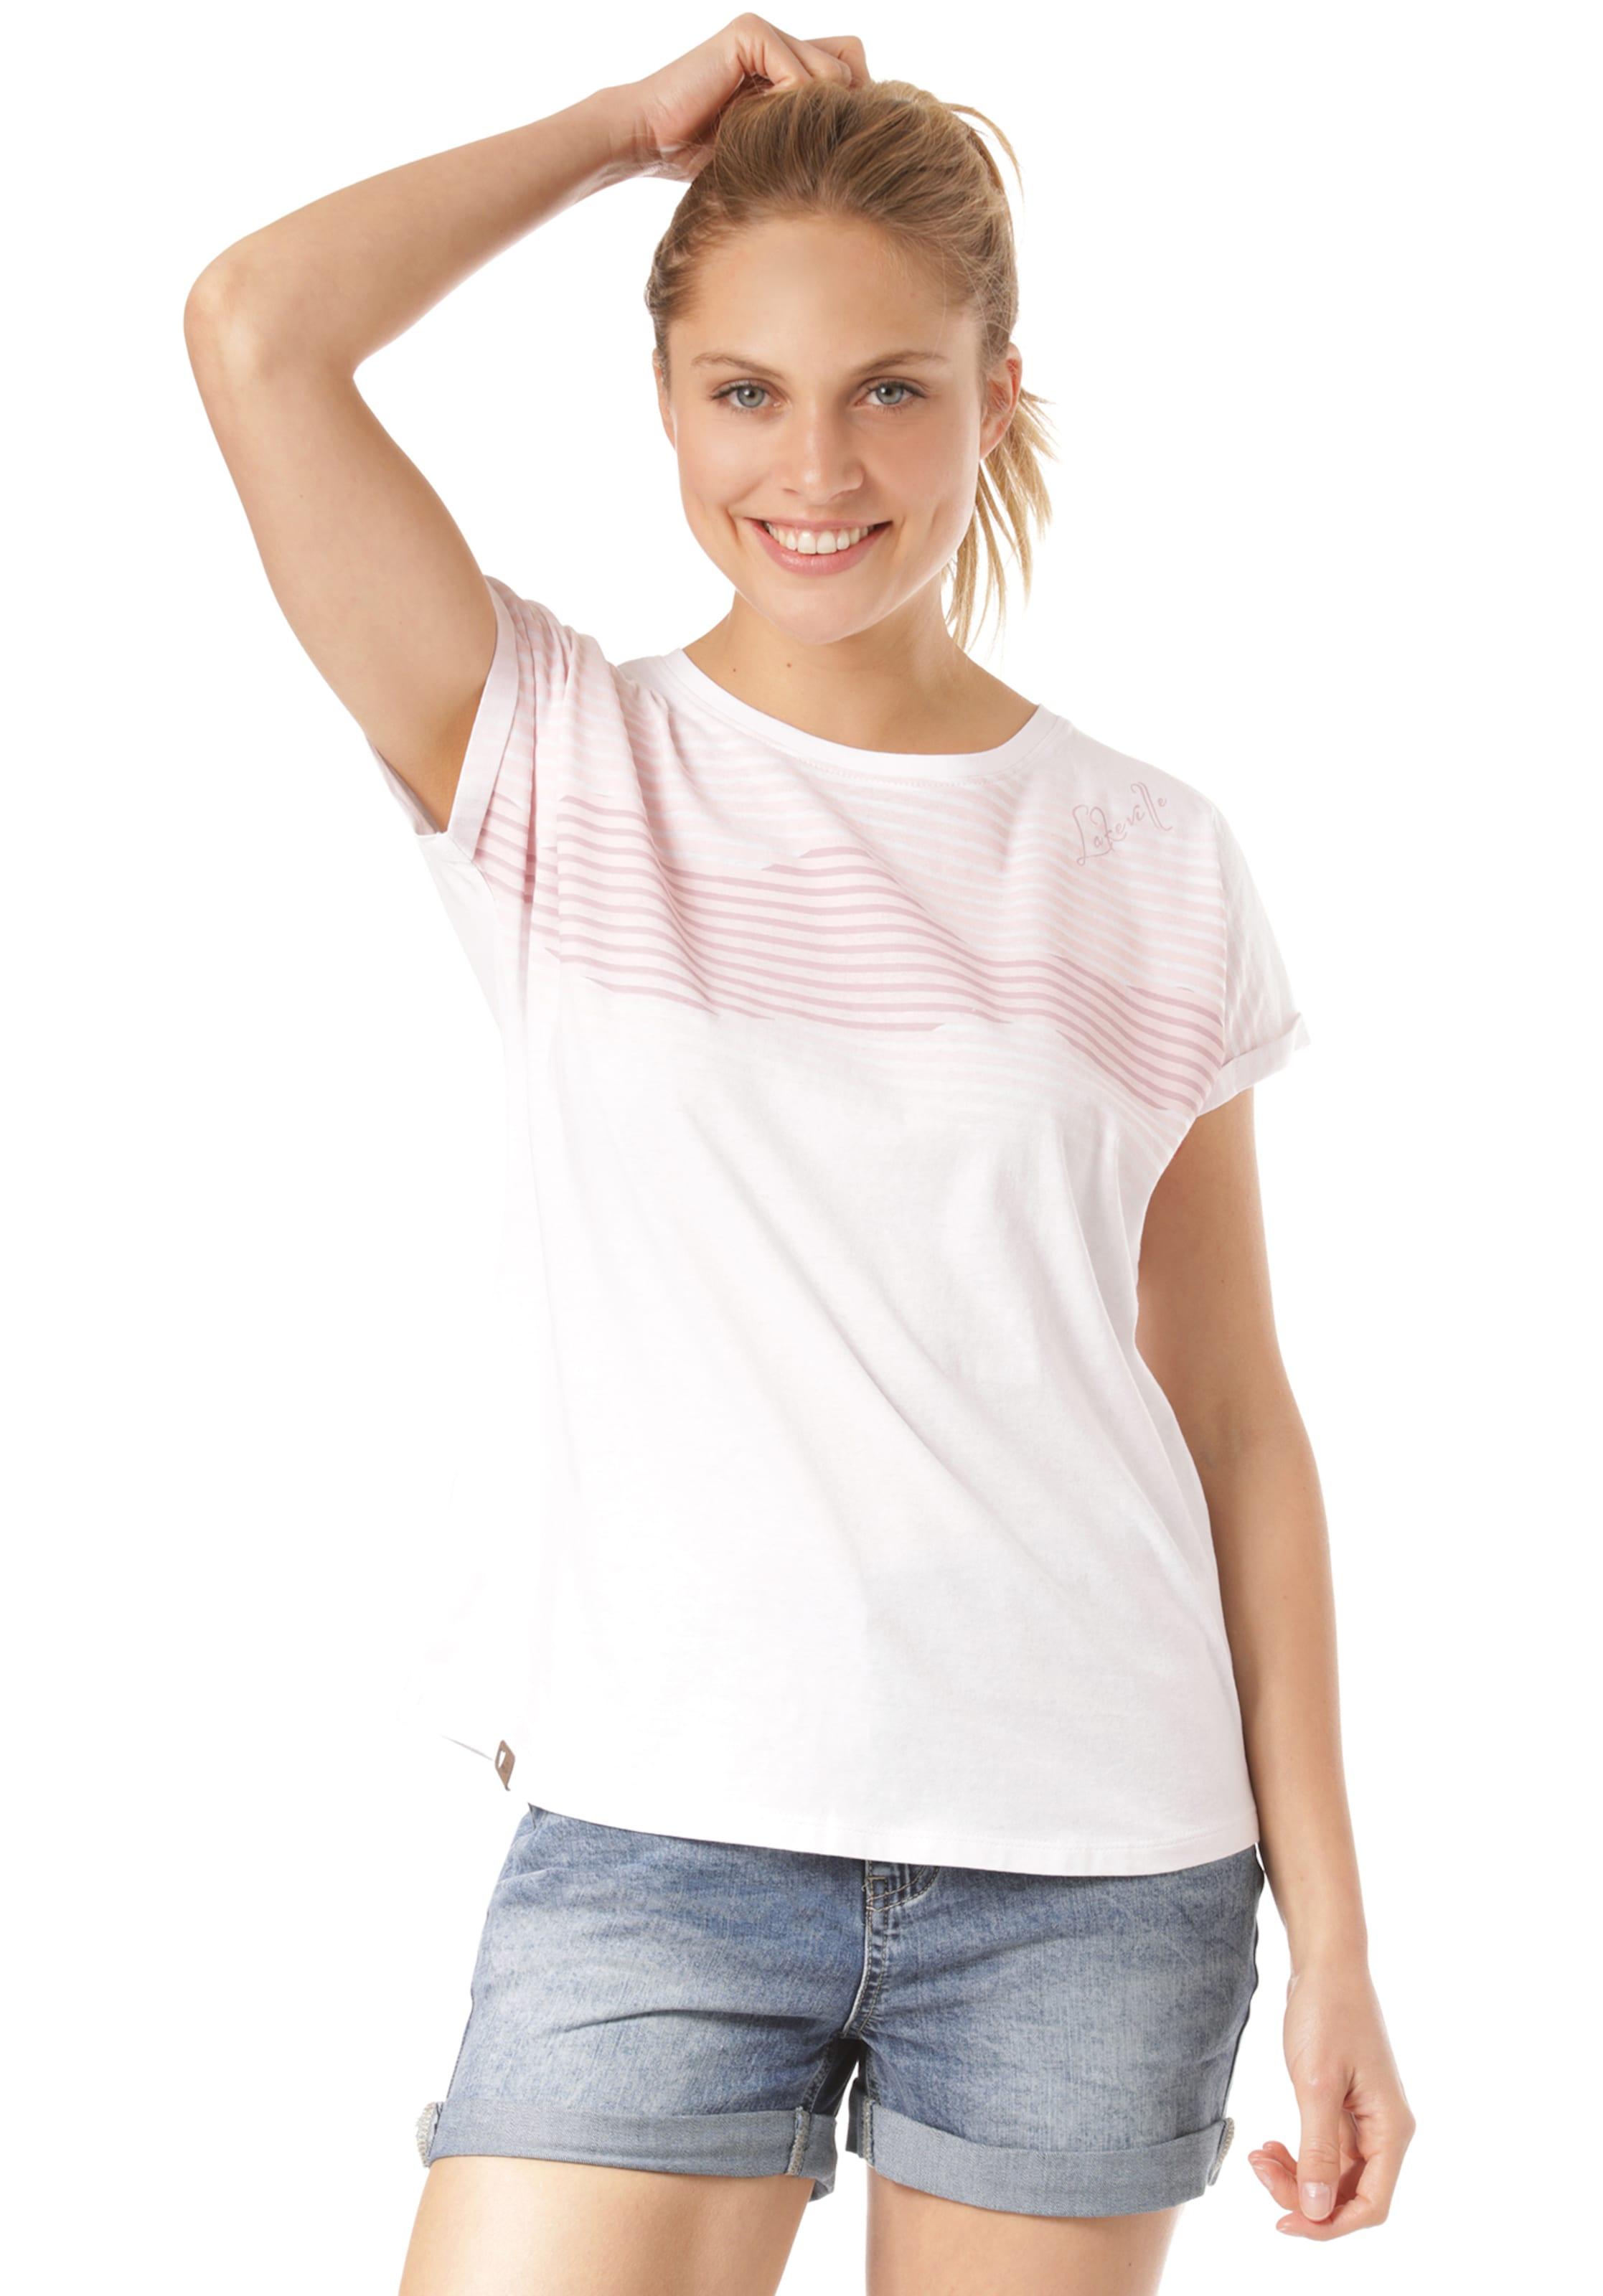 Lakeville In Mountain T 'waanje' shirt RosaWeiß 4AL5j3Rq